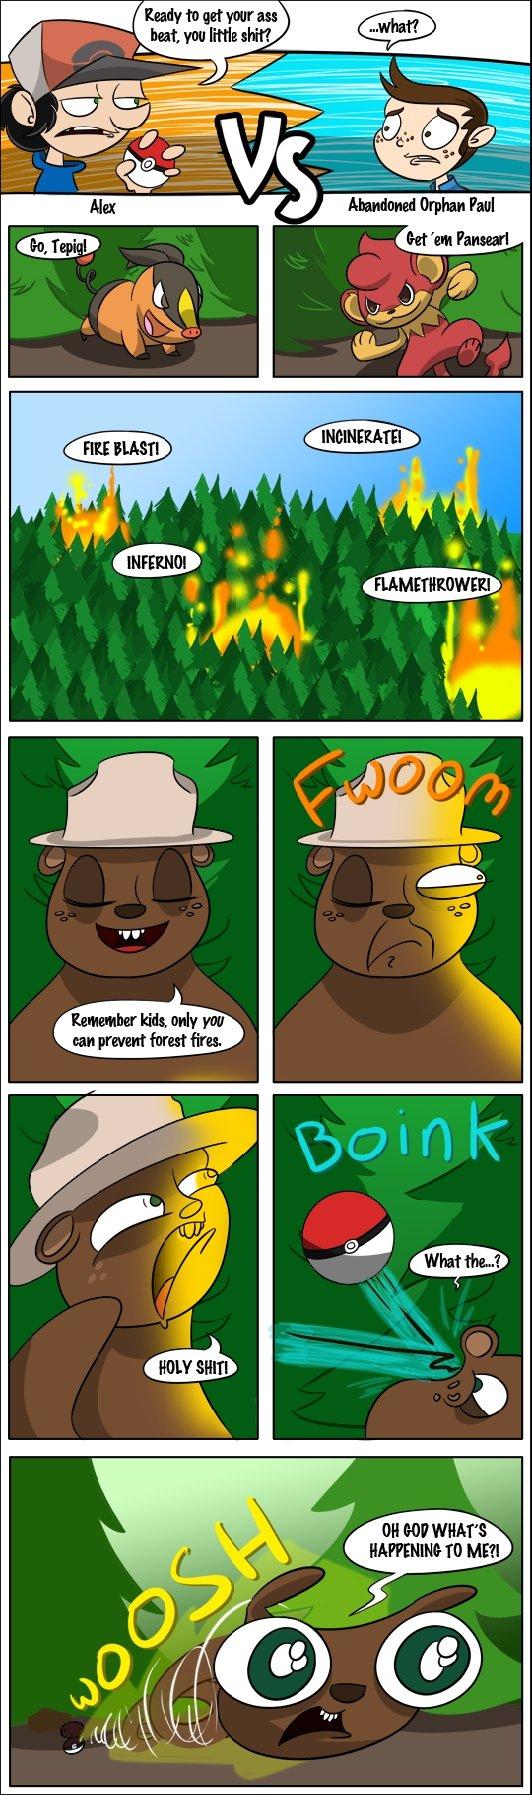 Smokey the Pokemon. thumb, subscribe, catch them all not mine found while stumbling. Pokemon smokey fire pokeball